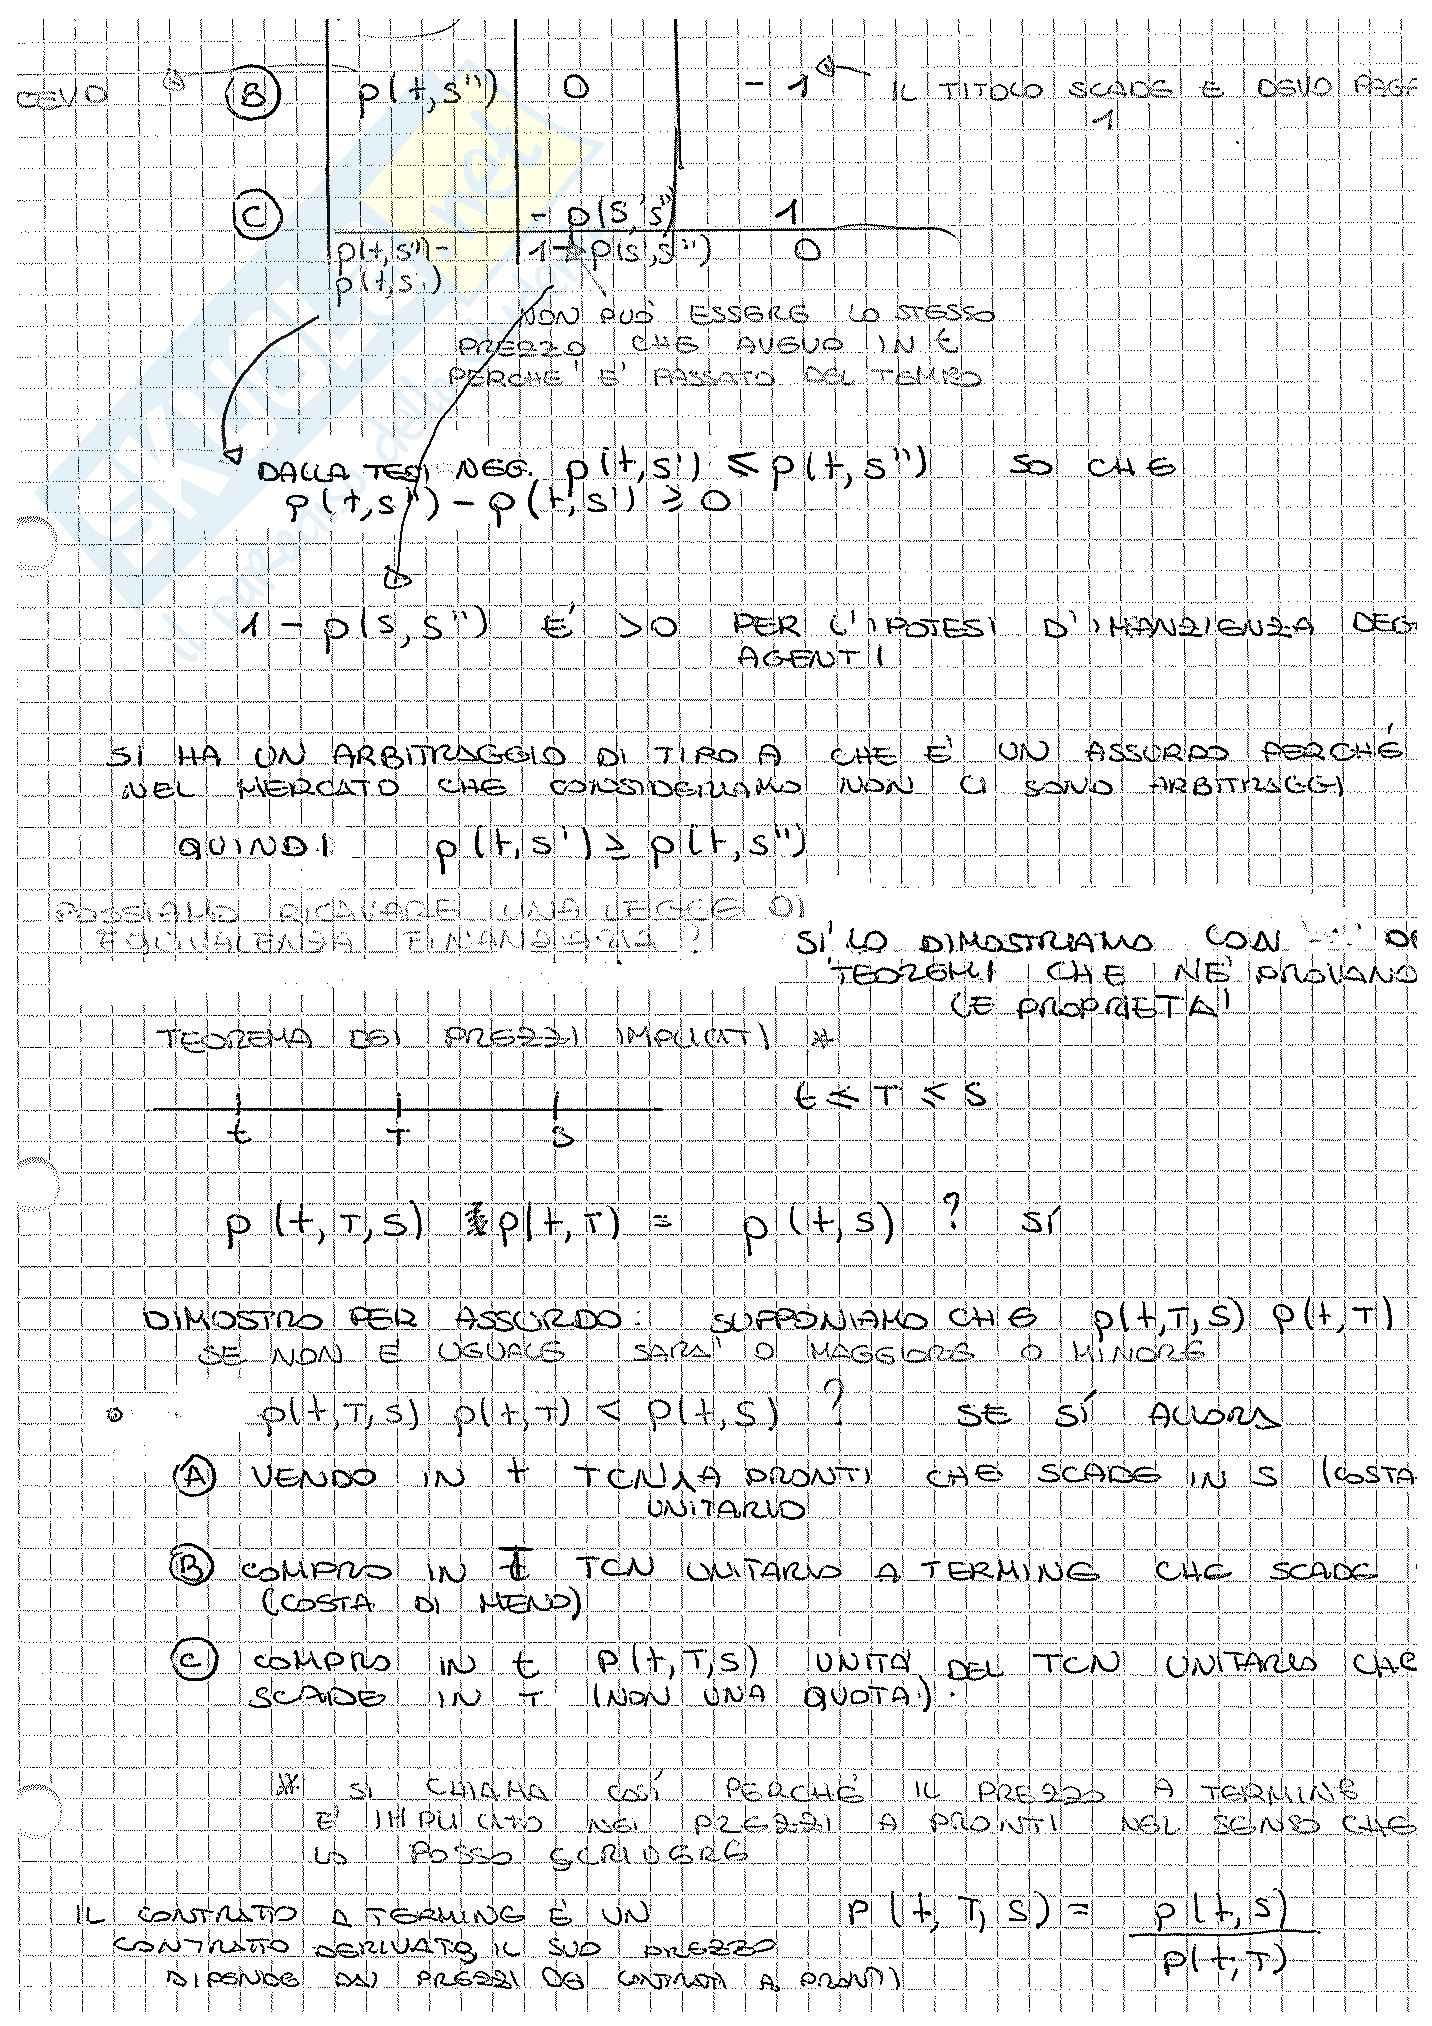 Appunti di Matematica Finanziaria, docente Claudio Pacati Pag. 61